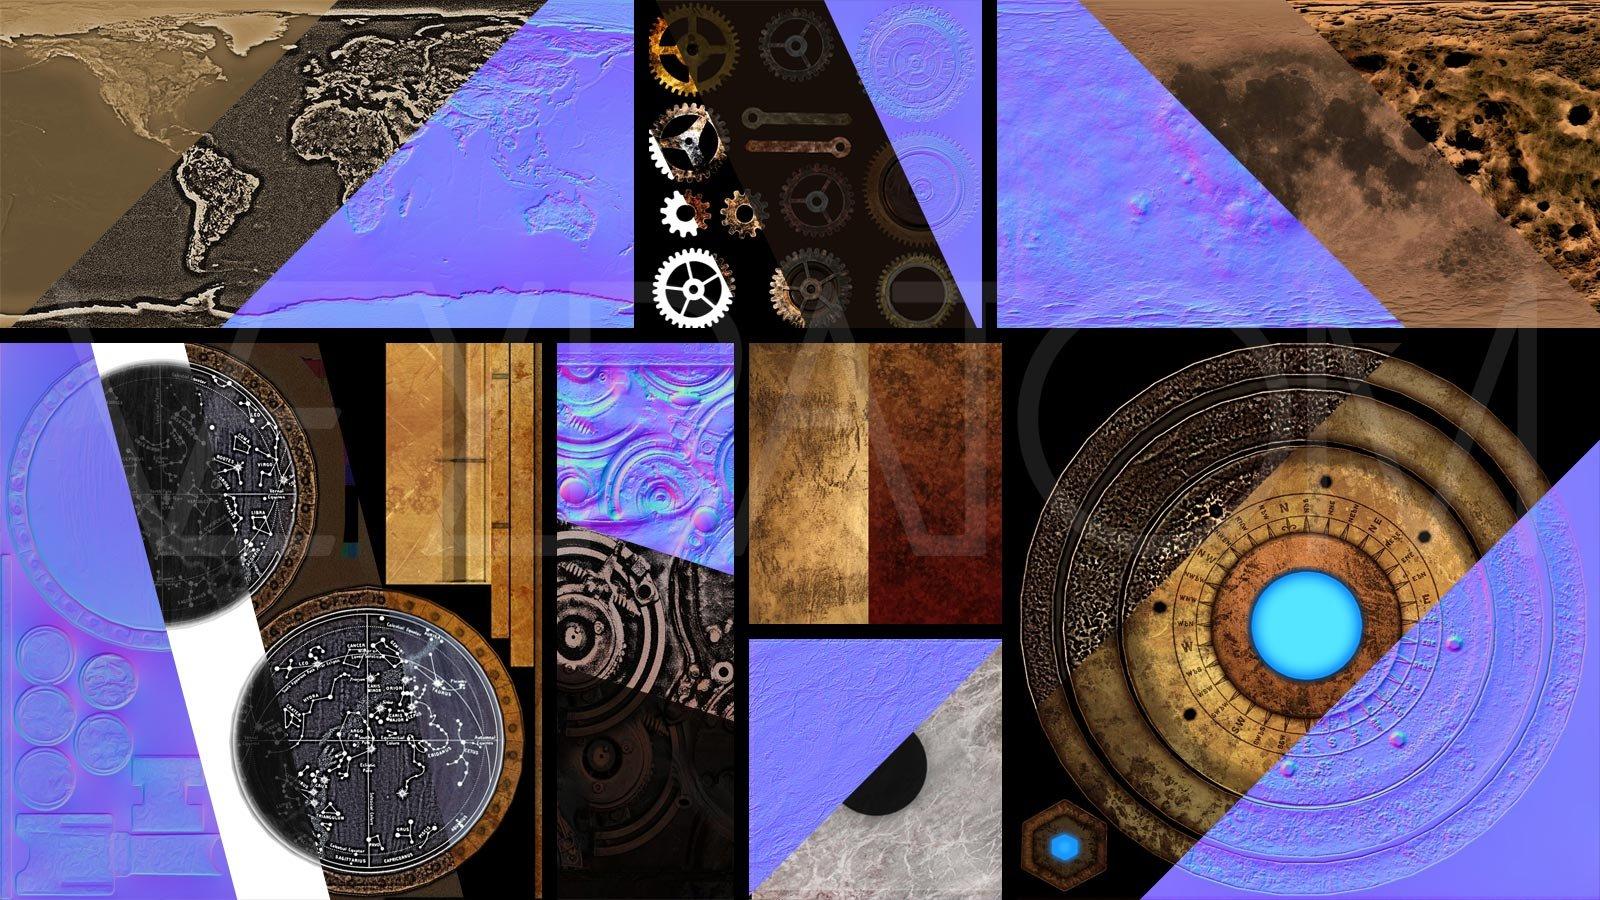 Thomas veyrat 01 steamearth textures